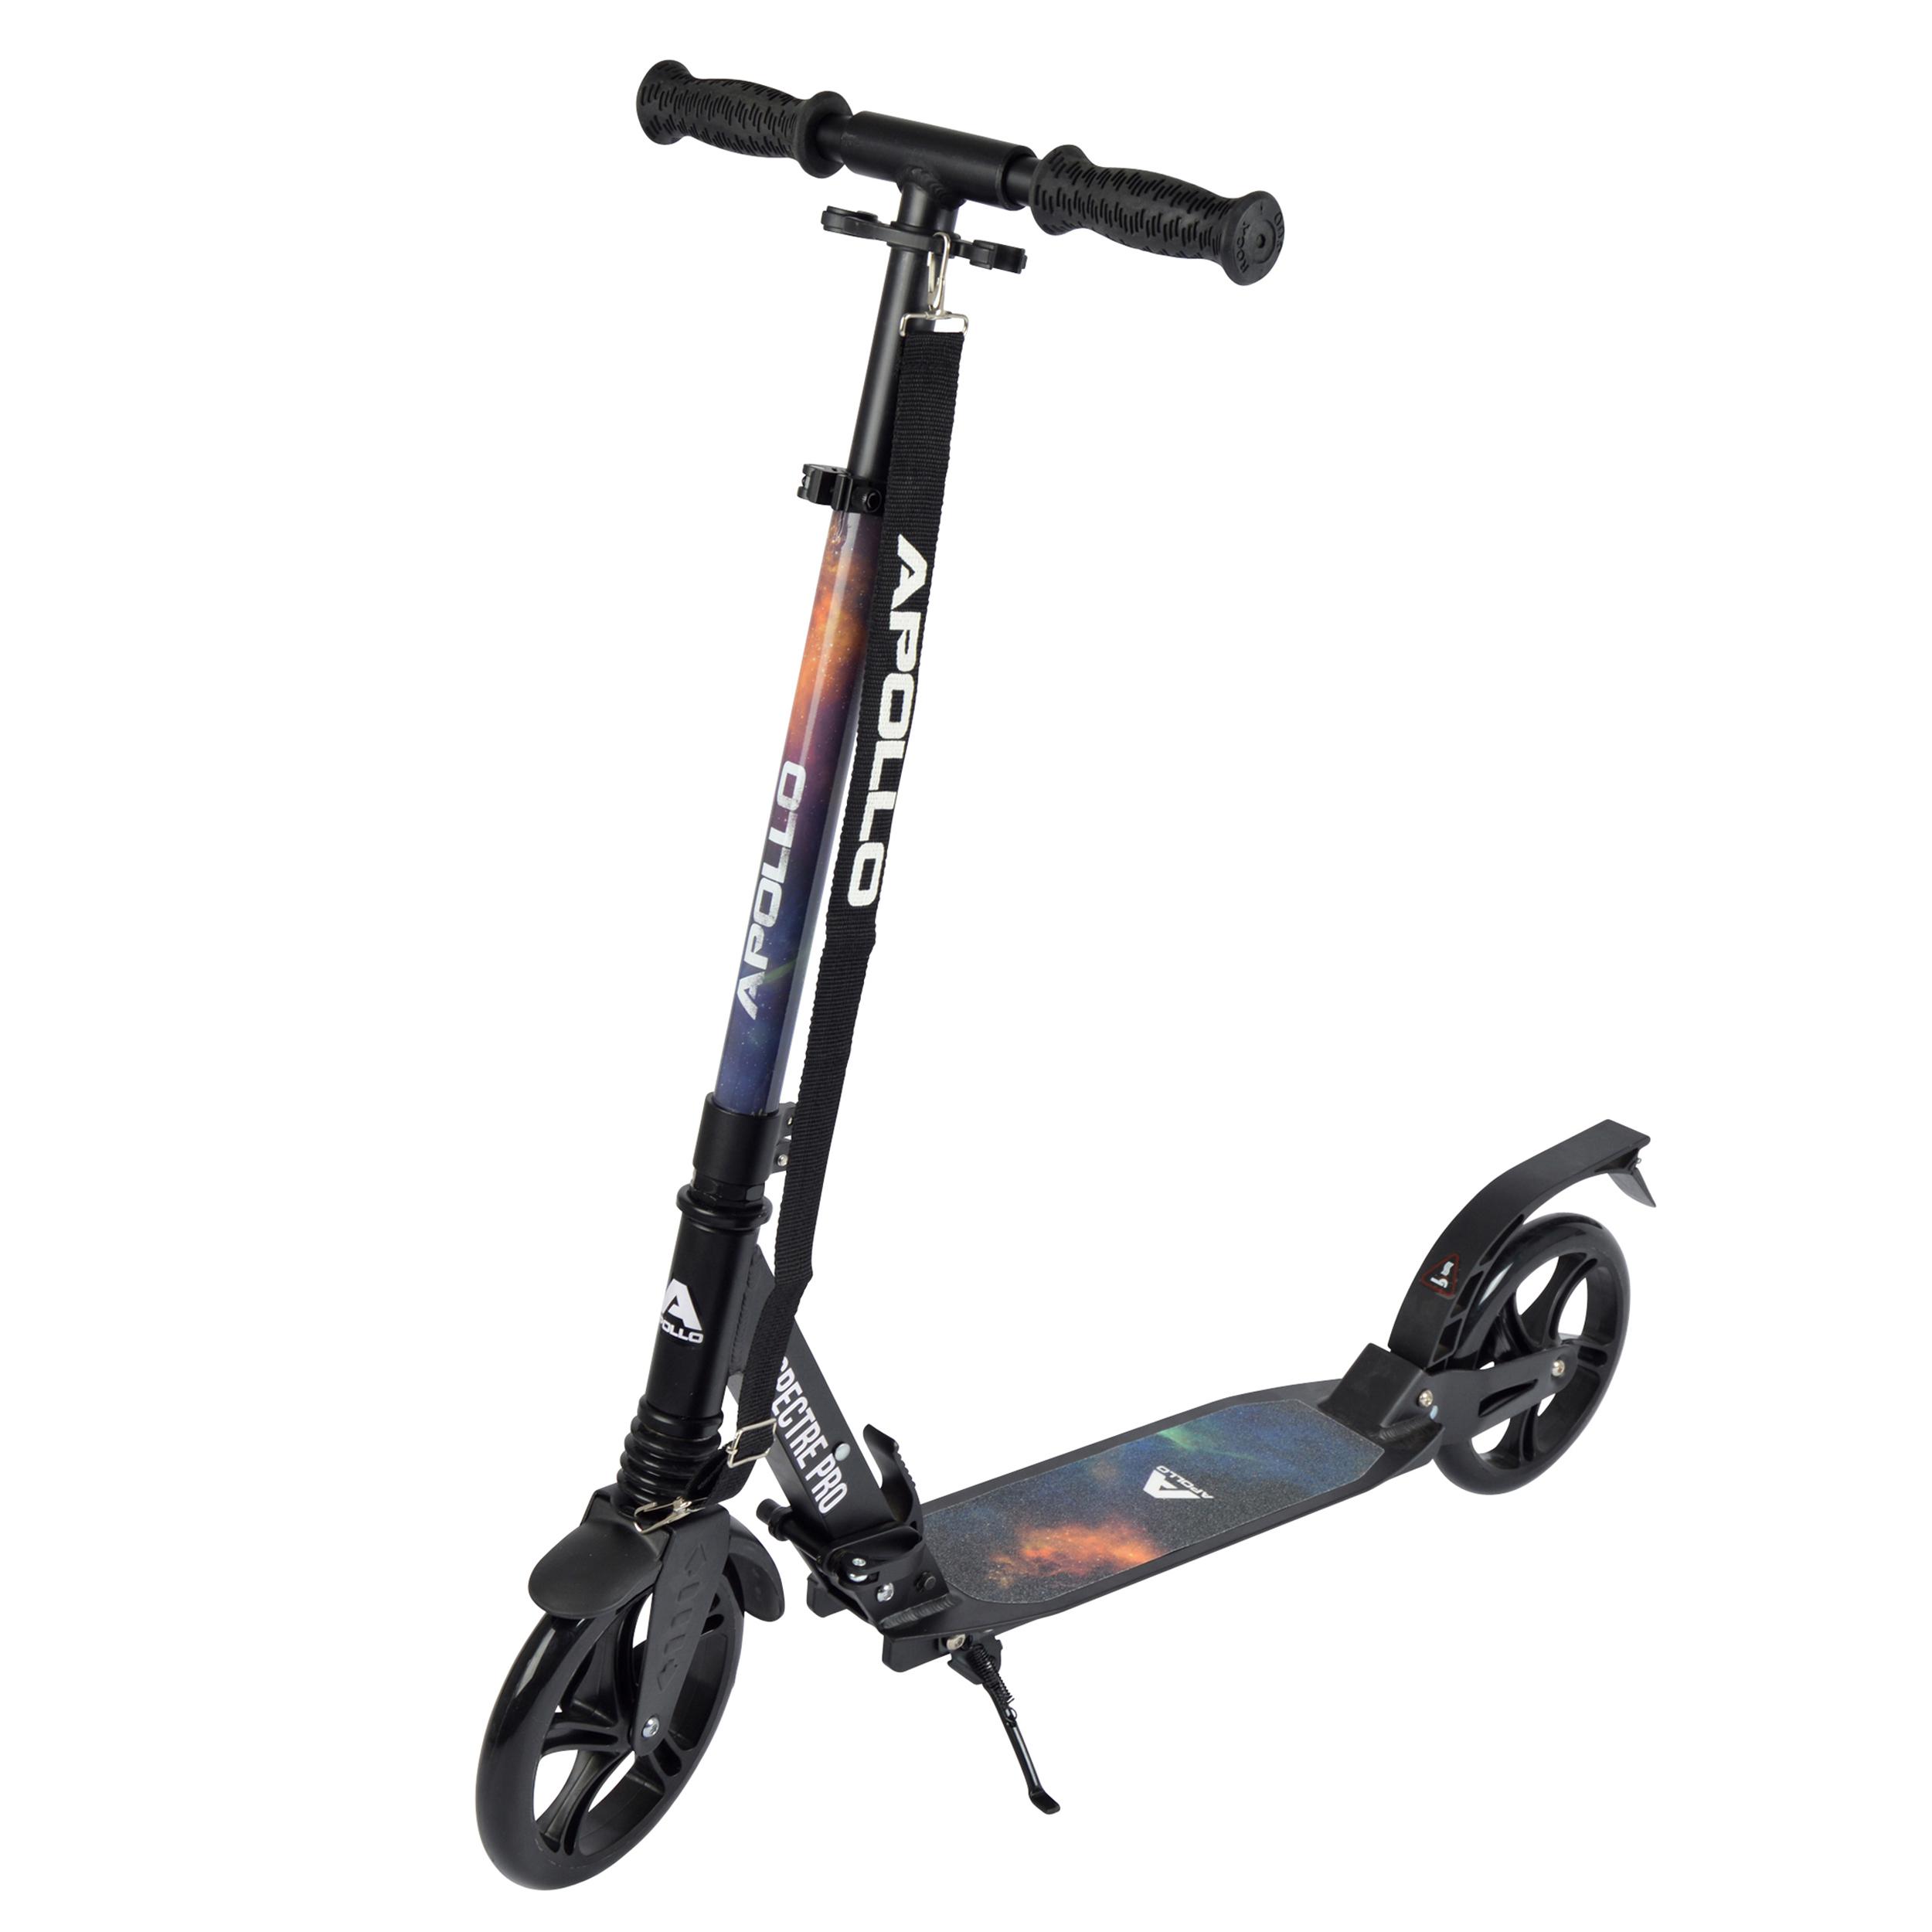 City Scooter - Spectre Pro - Galaxy